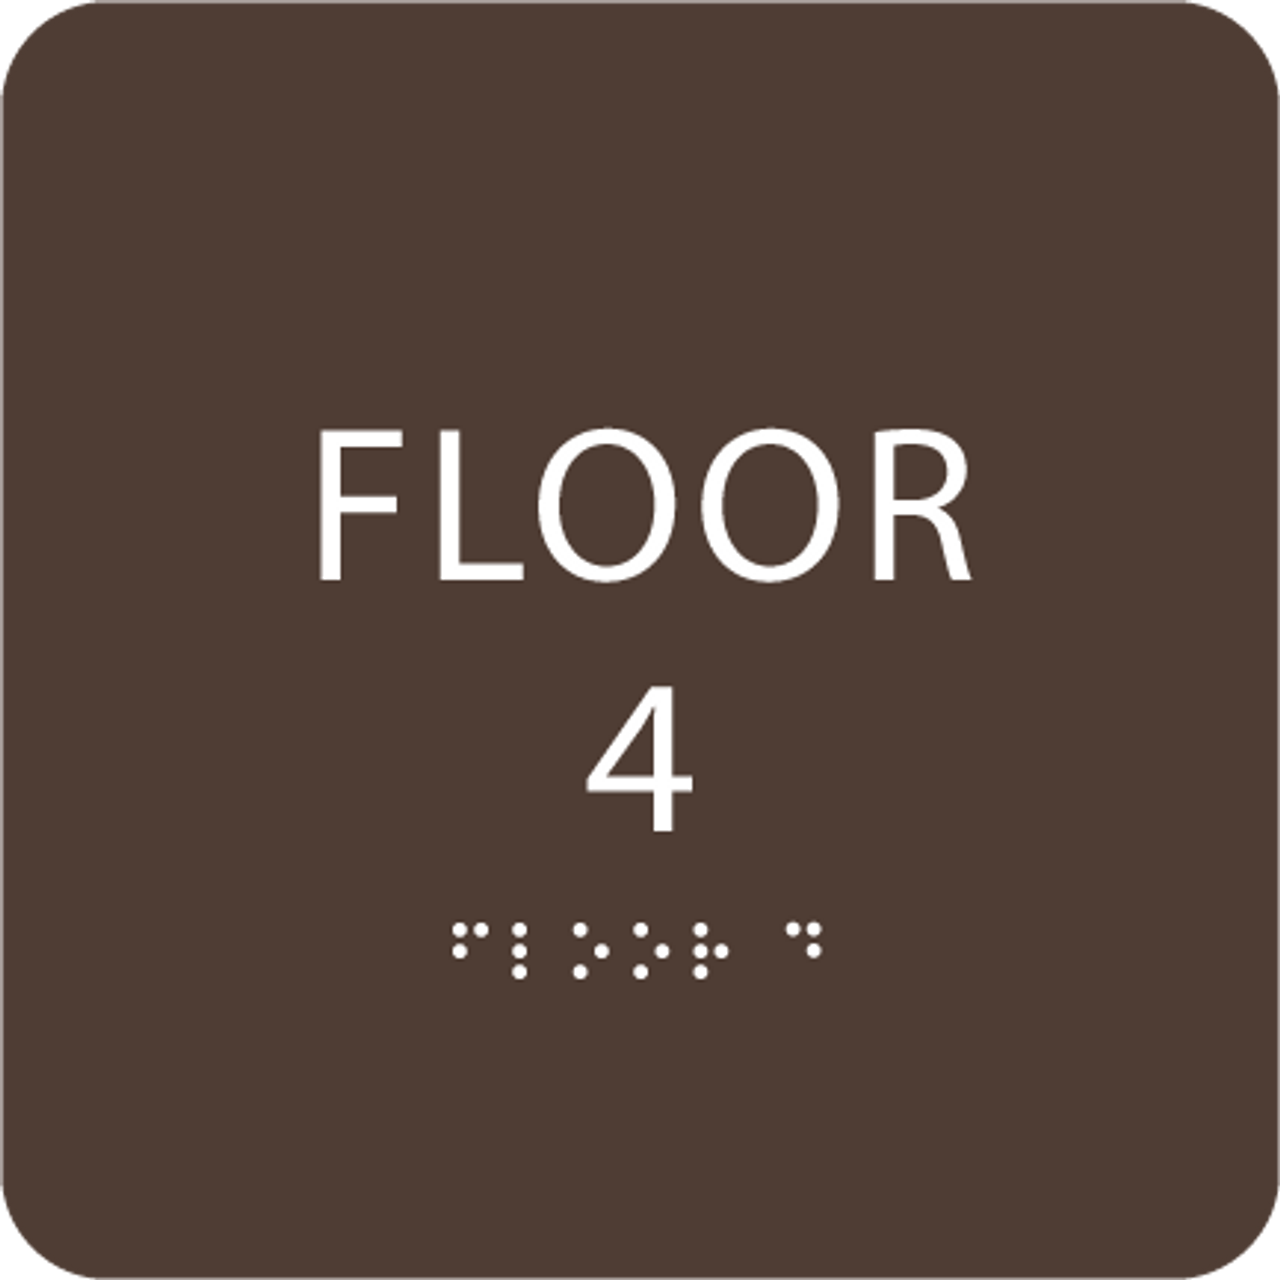 Dark Brown Floor 4 Identification Sign